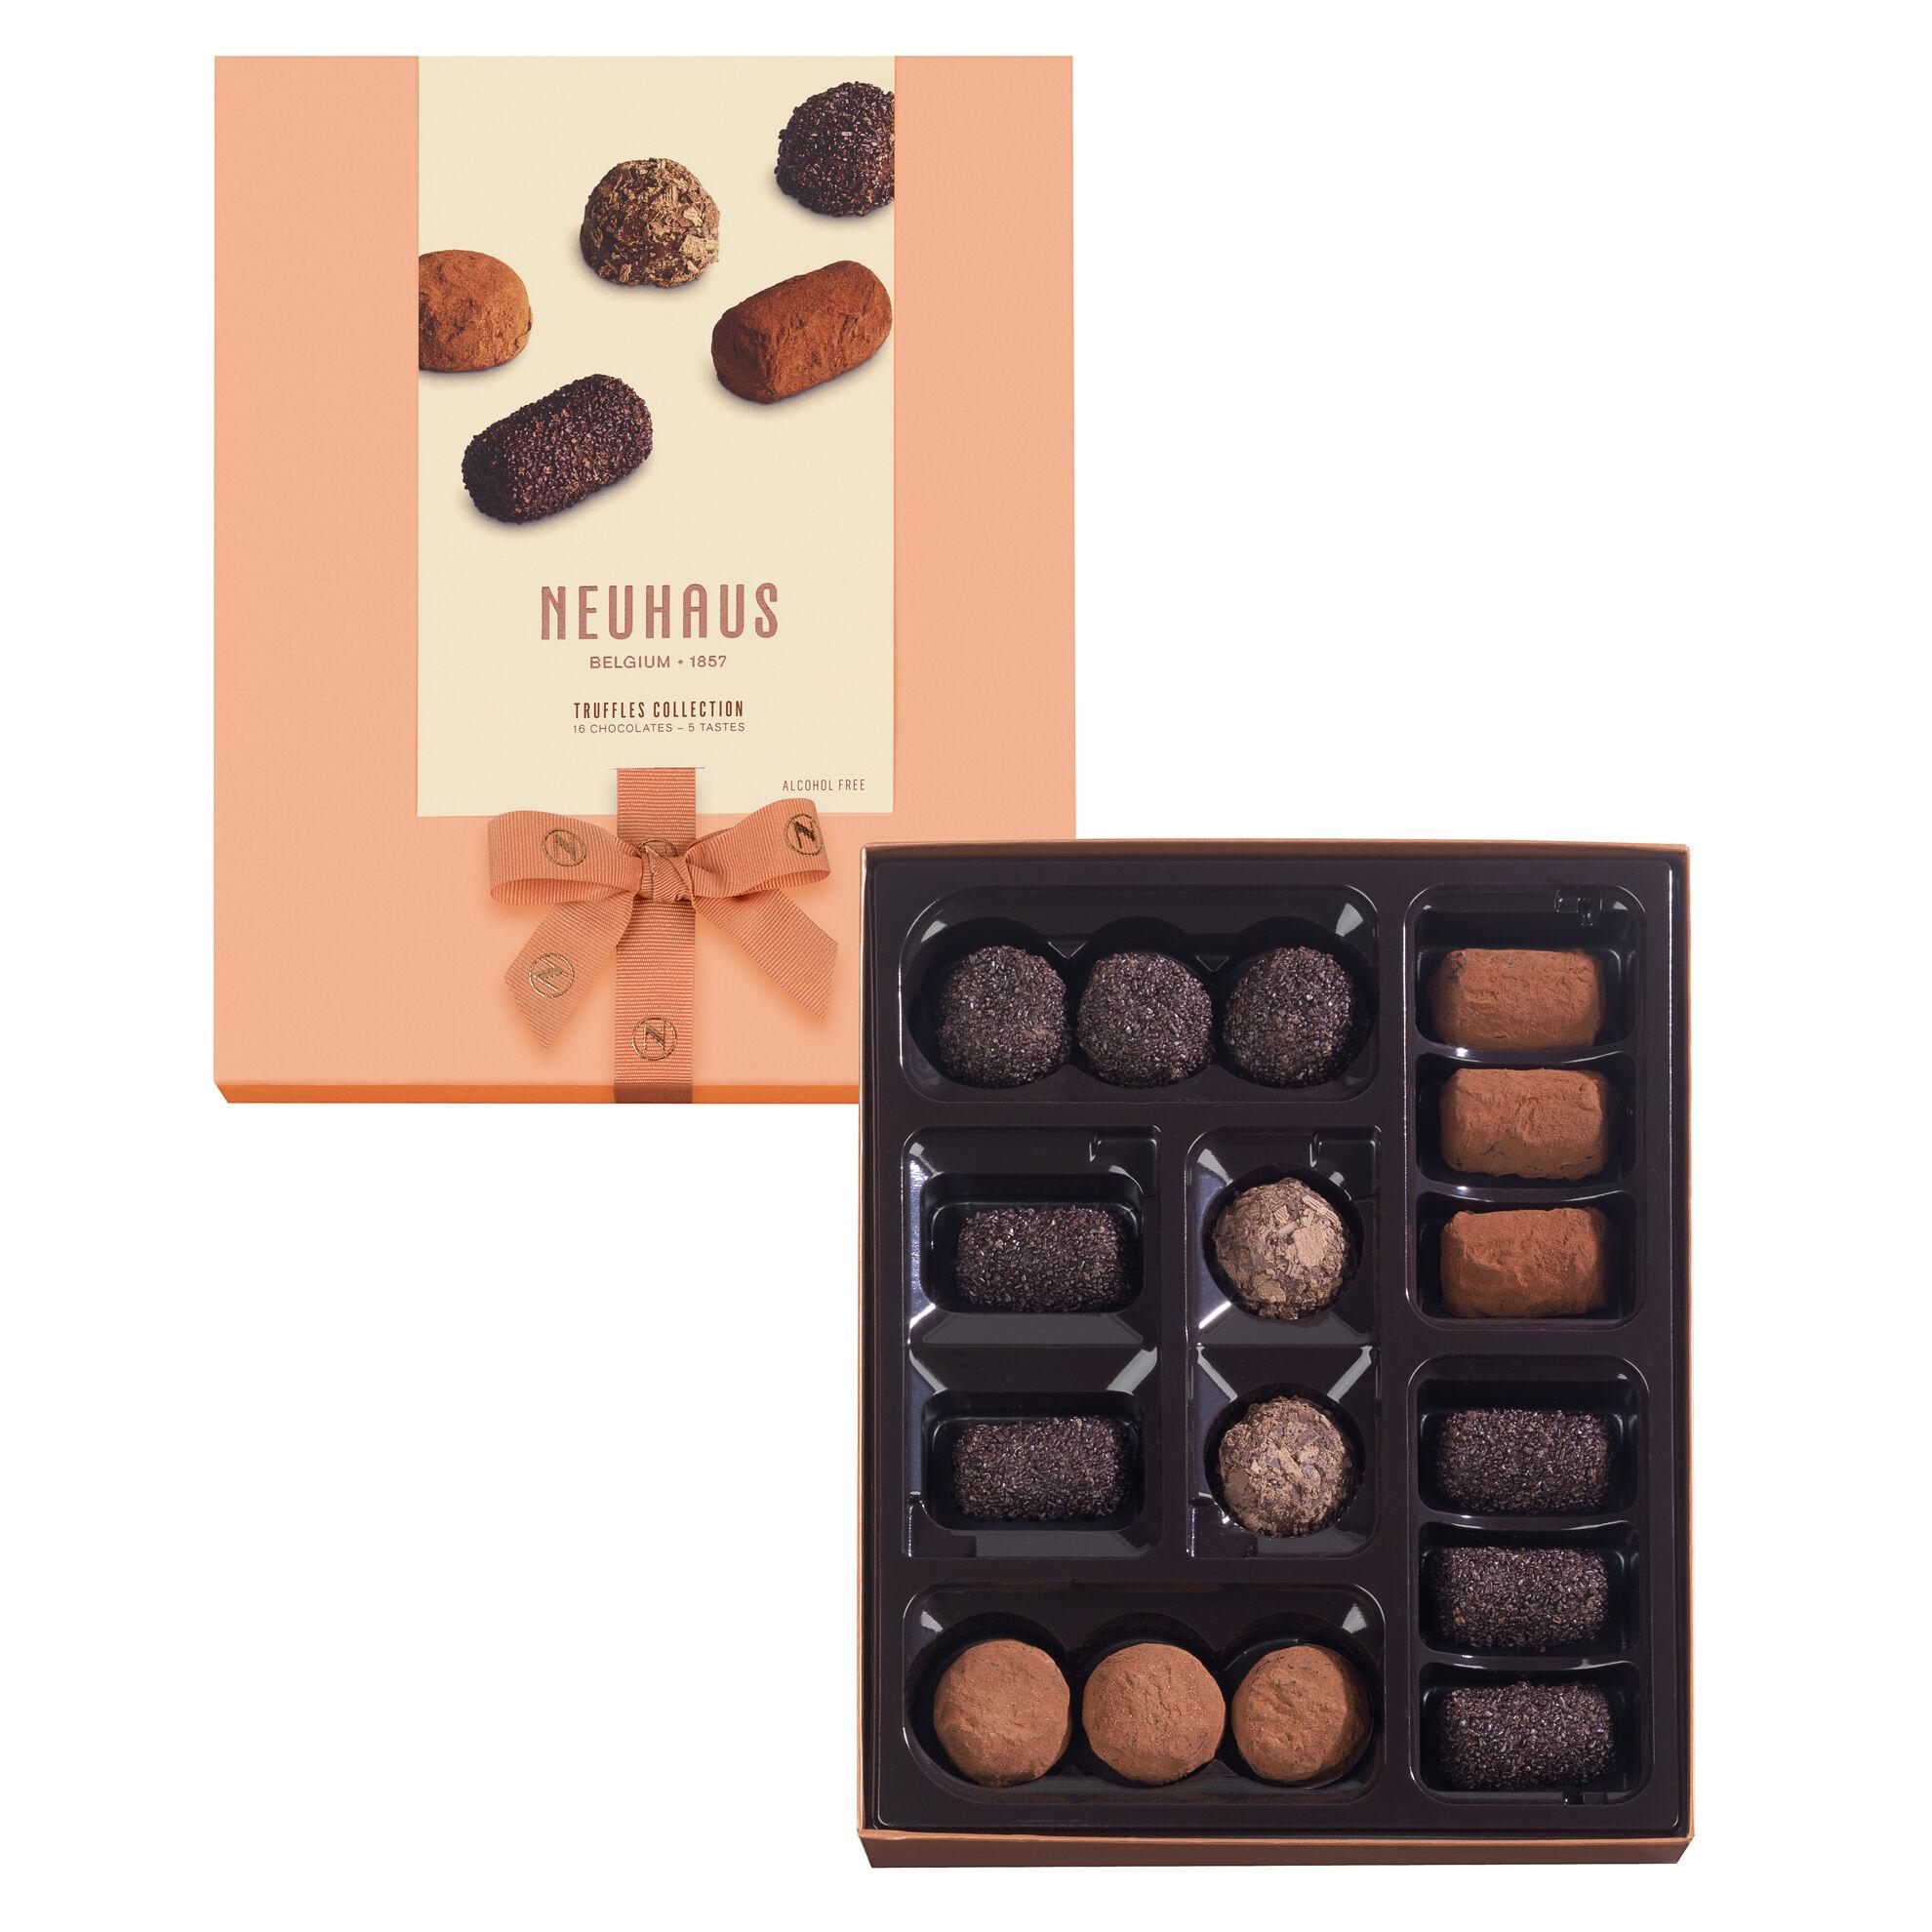 Neuhaus Collection Truffles Cocoa 16 pcs image number 01